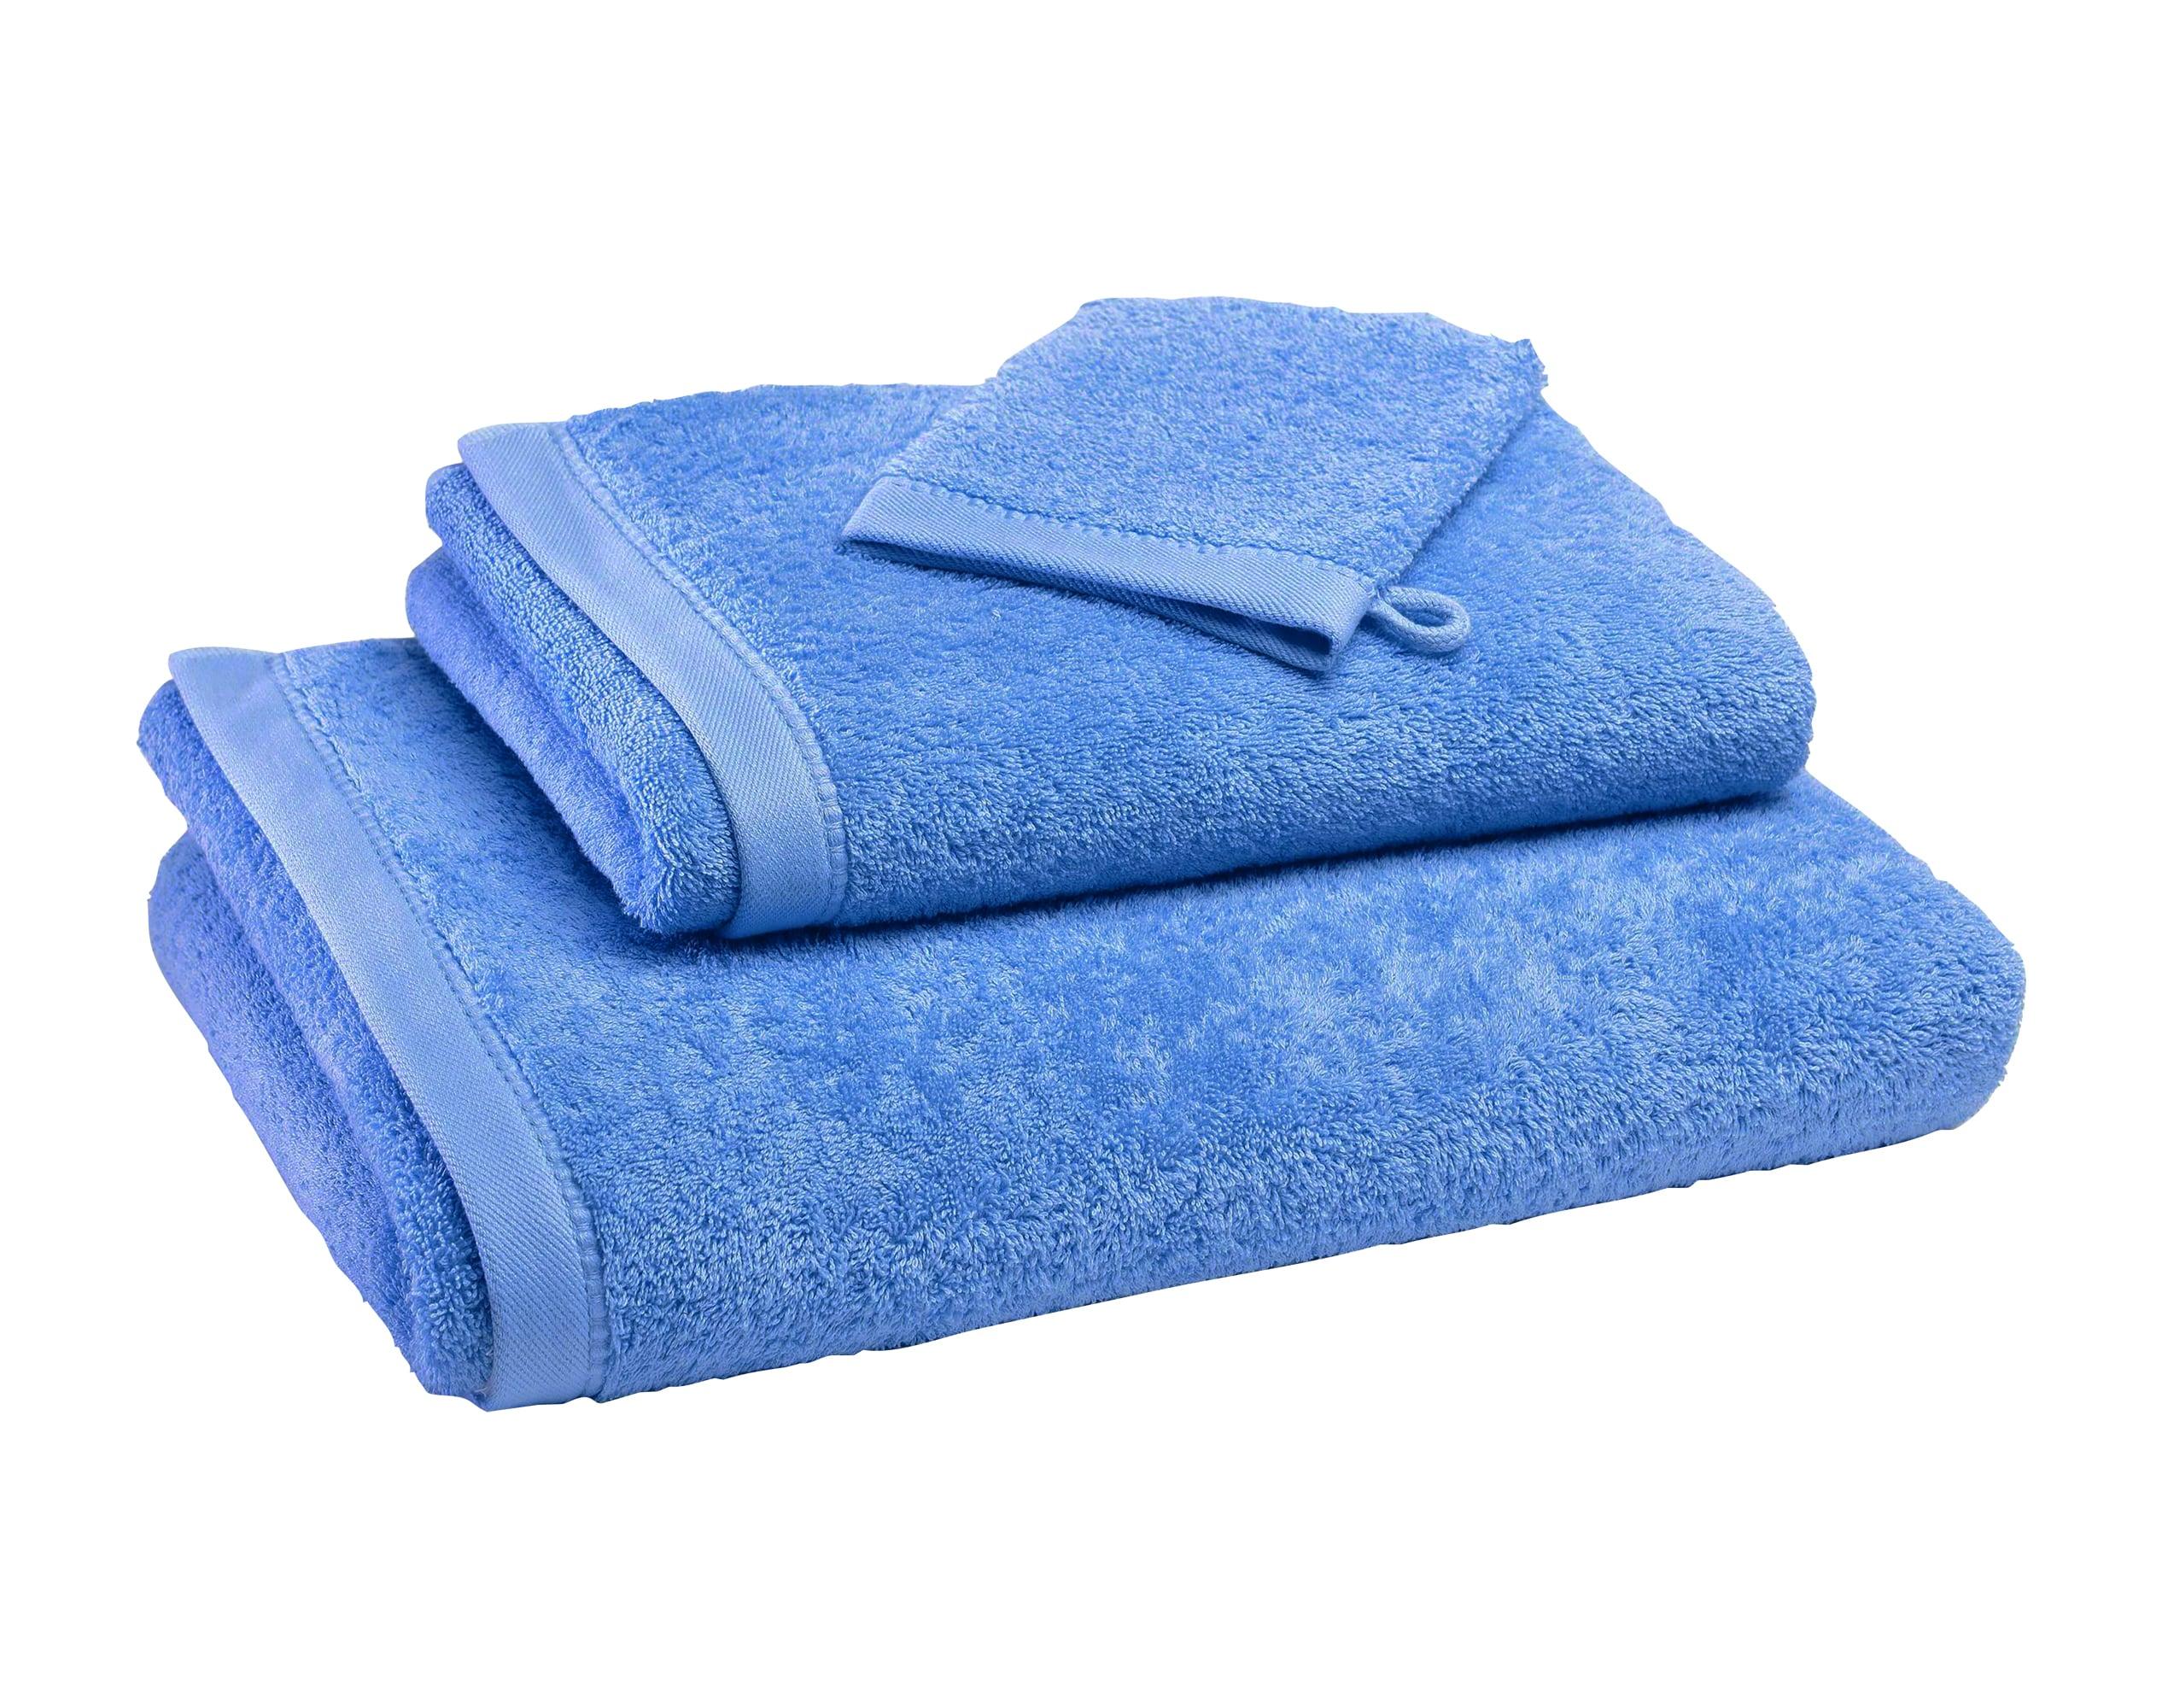 Gants de toilette bleu 15x21 en coton bio